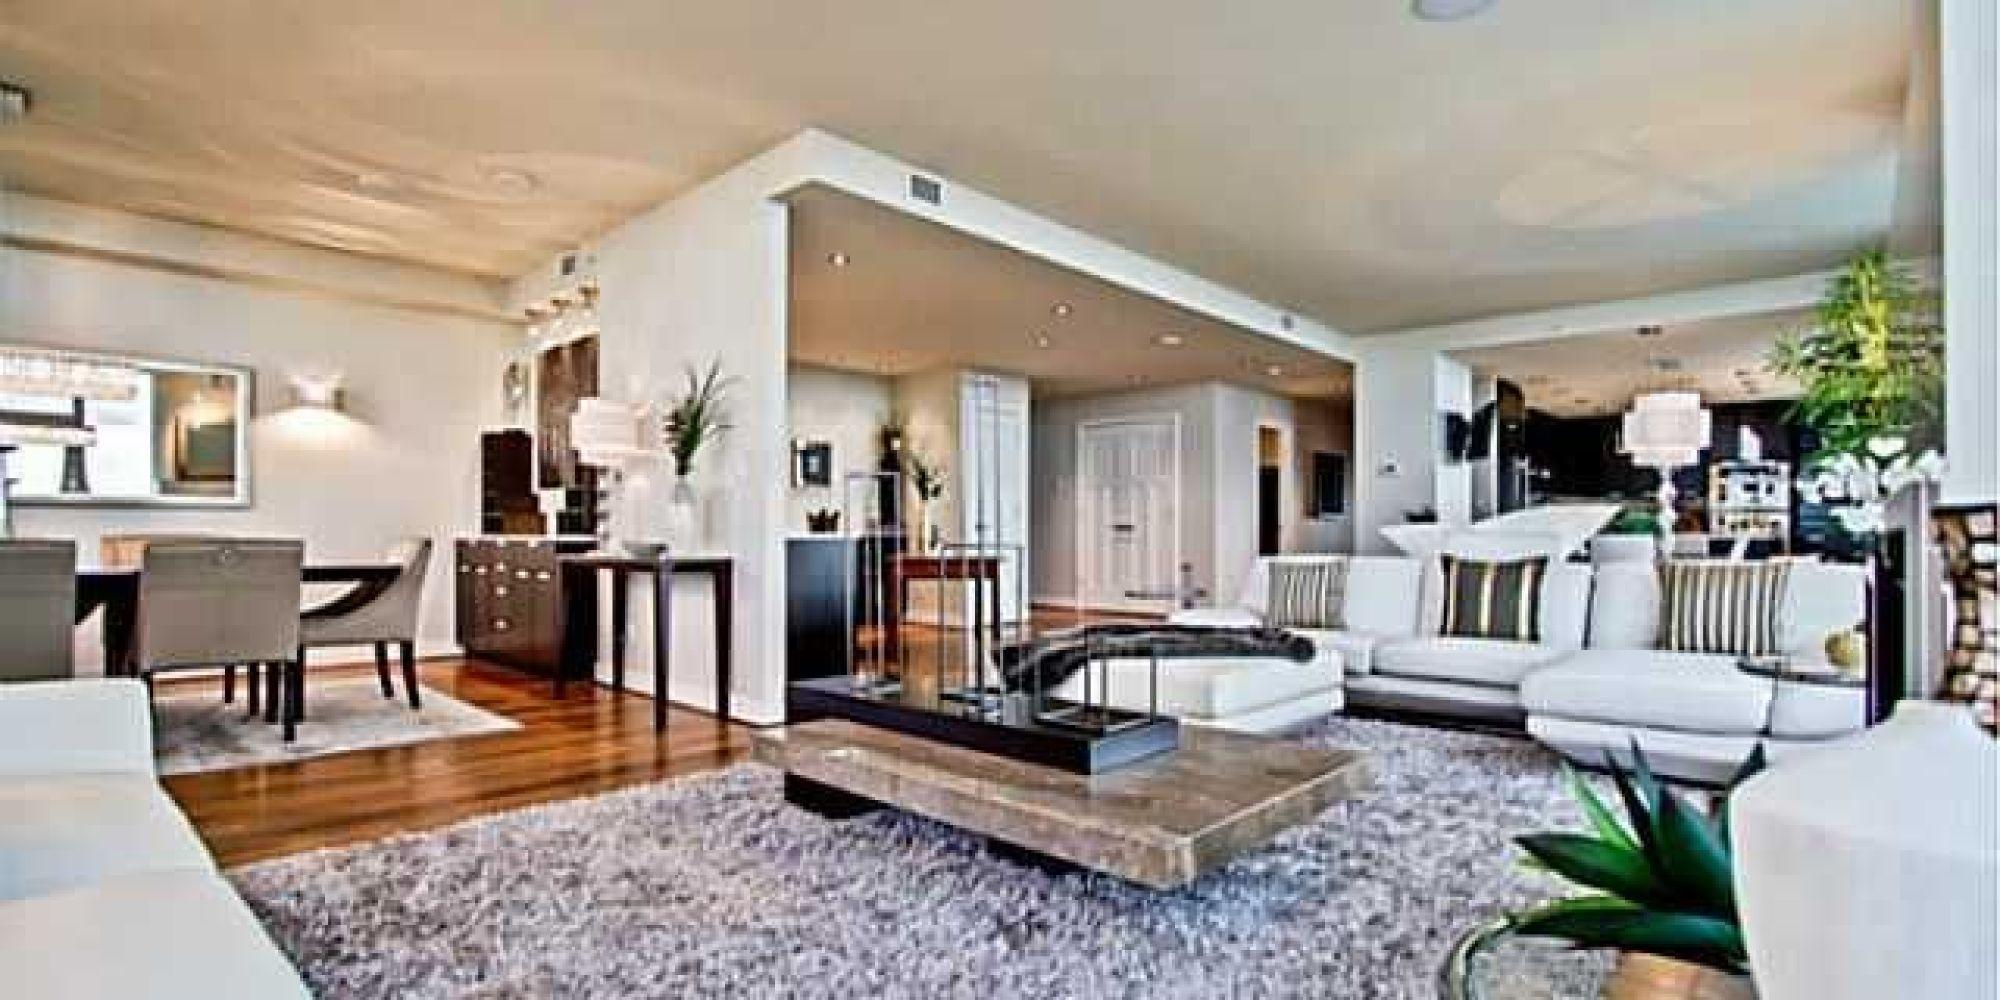 Alberta Rental Apartment Vacancy Rates Lowest In Canada CMHC